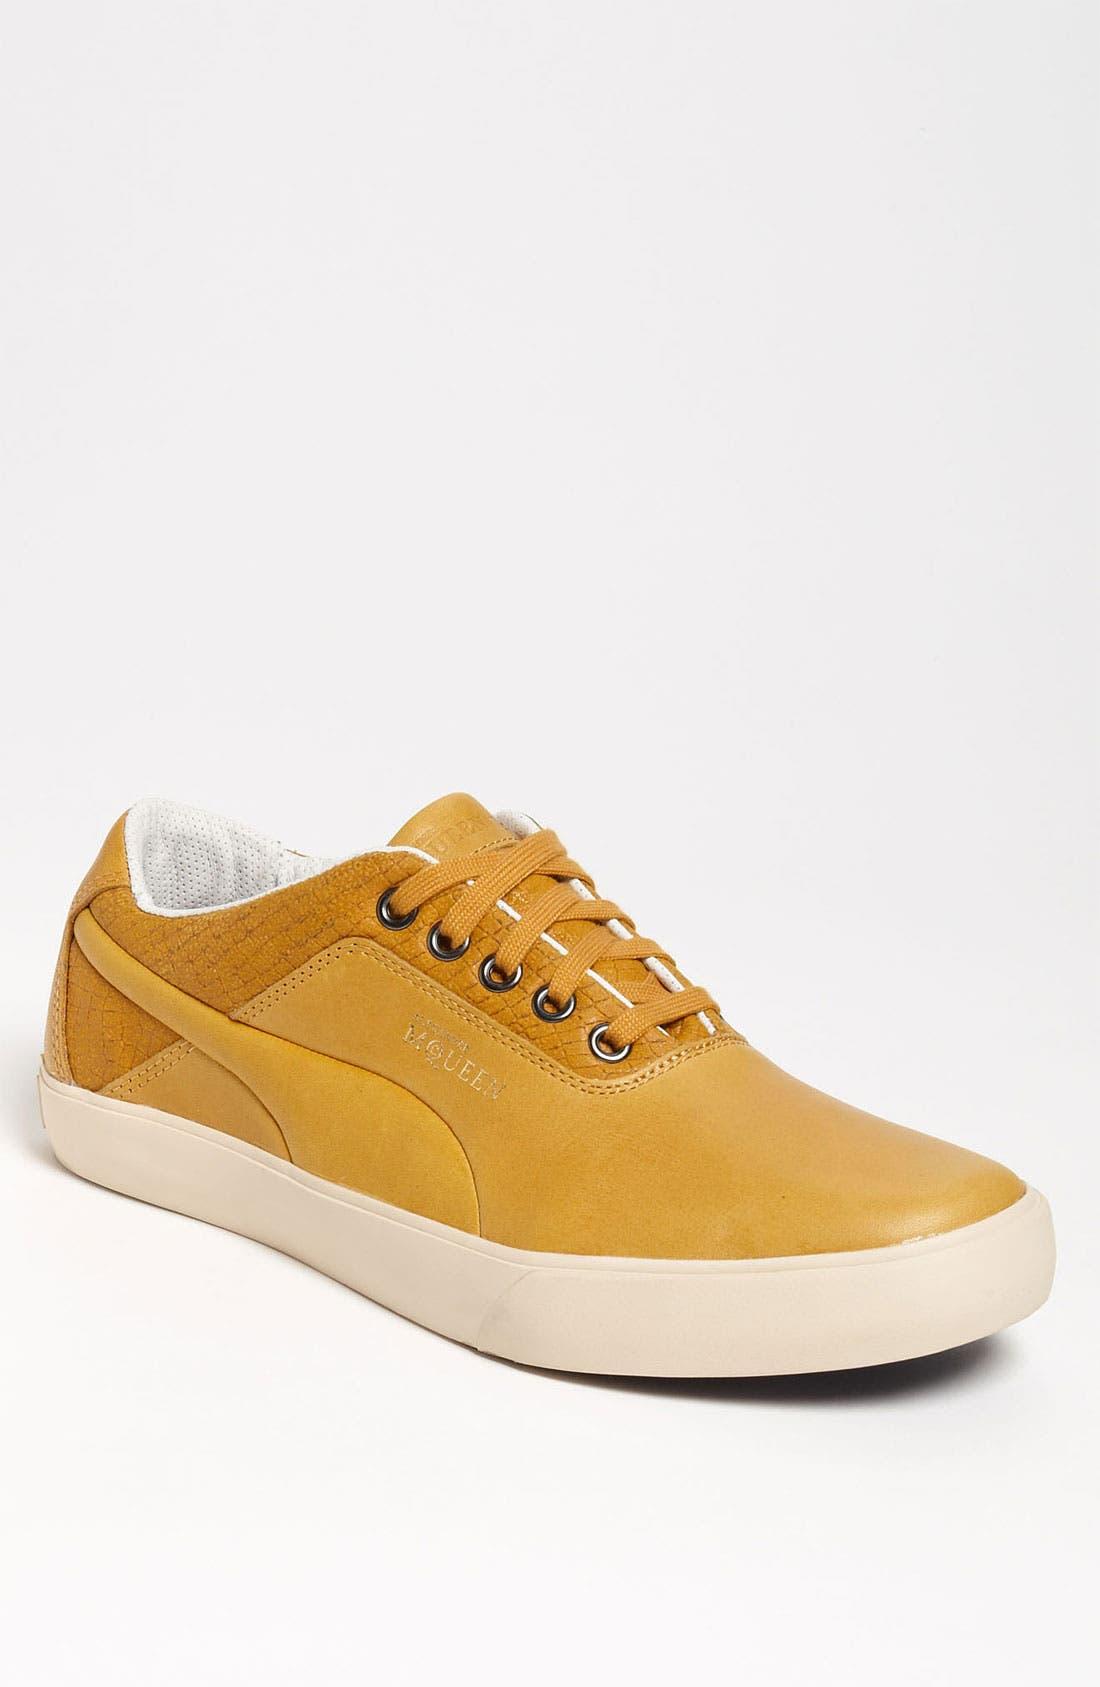 Alternate Image 1 Selected - Alexander McQueen PUMA 'Deck Lo' Sneaker